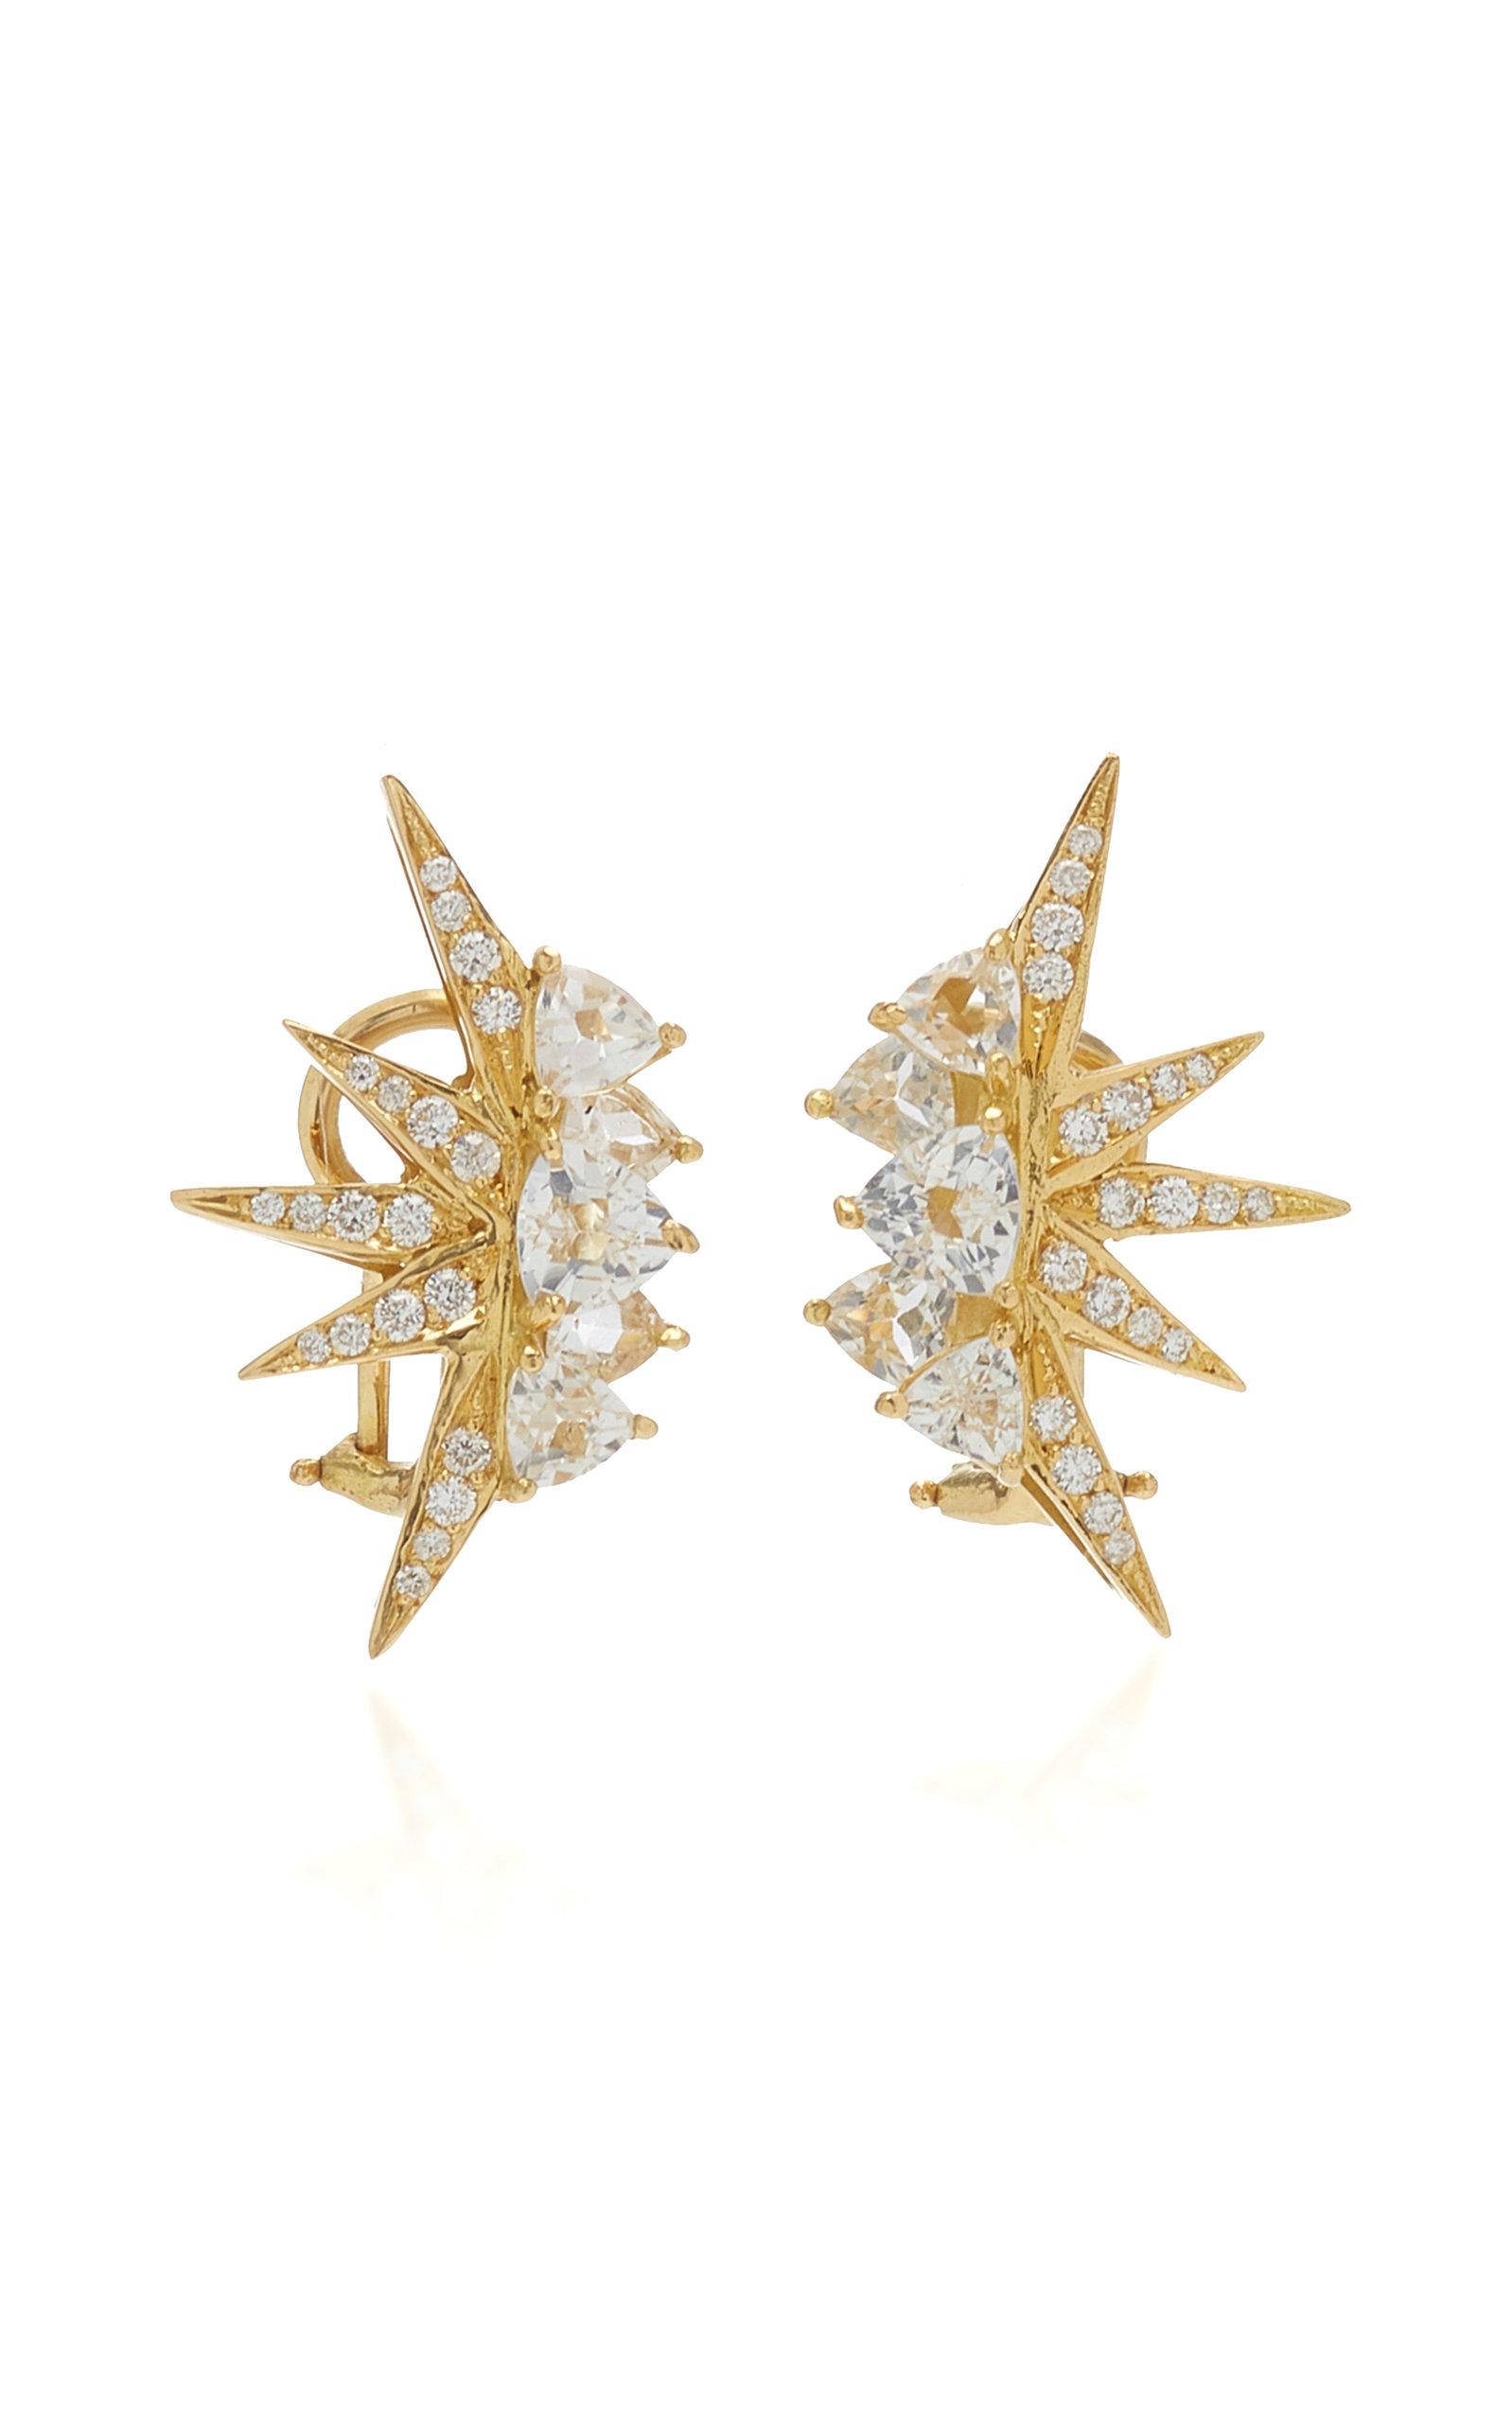 Women's Electra Mini 18K Yellow Gold Topaz; Diamond Earrings